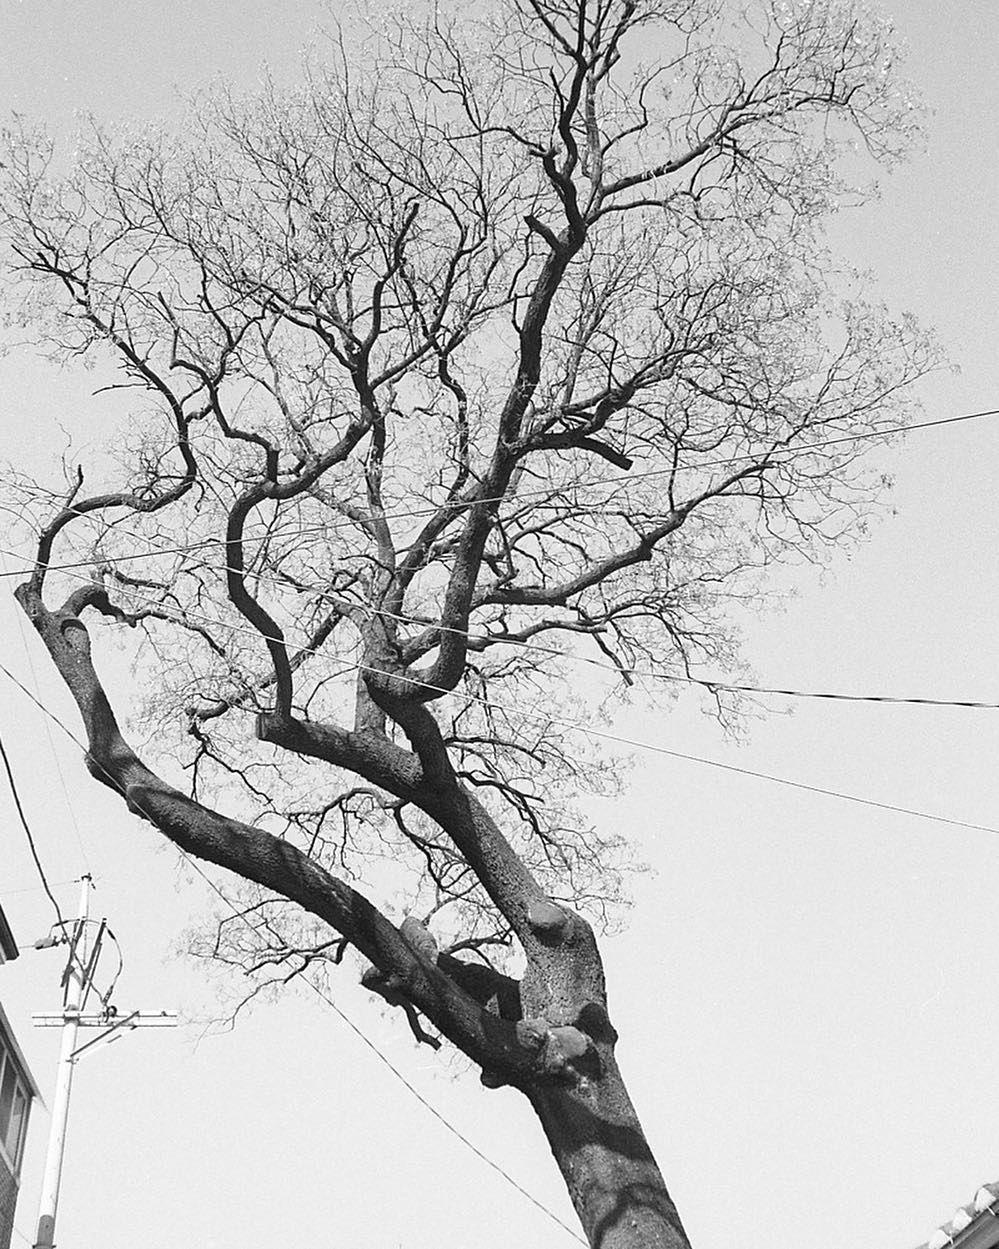 Shared by baksooyeon #landscape #contratahotel (o) http://ift.tt/1Q7s7Z2 2016.02.06 이 고난 끝에 행복이 있길  Tmax 100 - #라이카 #m6 #티맥스 #일상사진 #스냅사진 #데일리 #일상 #서울 #한국 #vscocam #vscogood #leica #leicam6 #35mm #tmax #bw #film #filmphotography #filmisnotdead #bwphotography #daily #instadaily #instagood #all_shots #instasize  #cityscape #seoul #korea #streetphotography